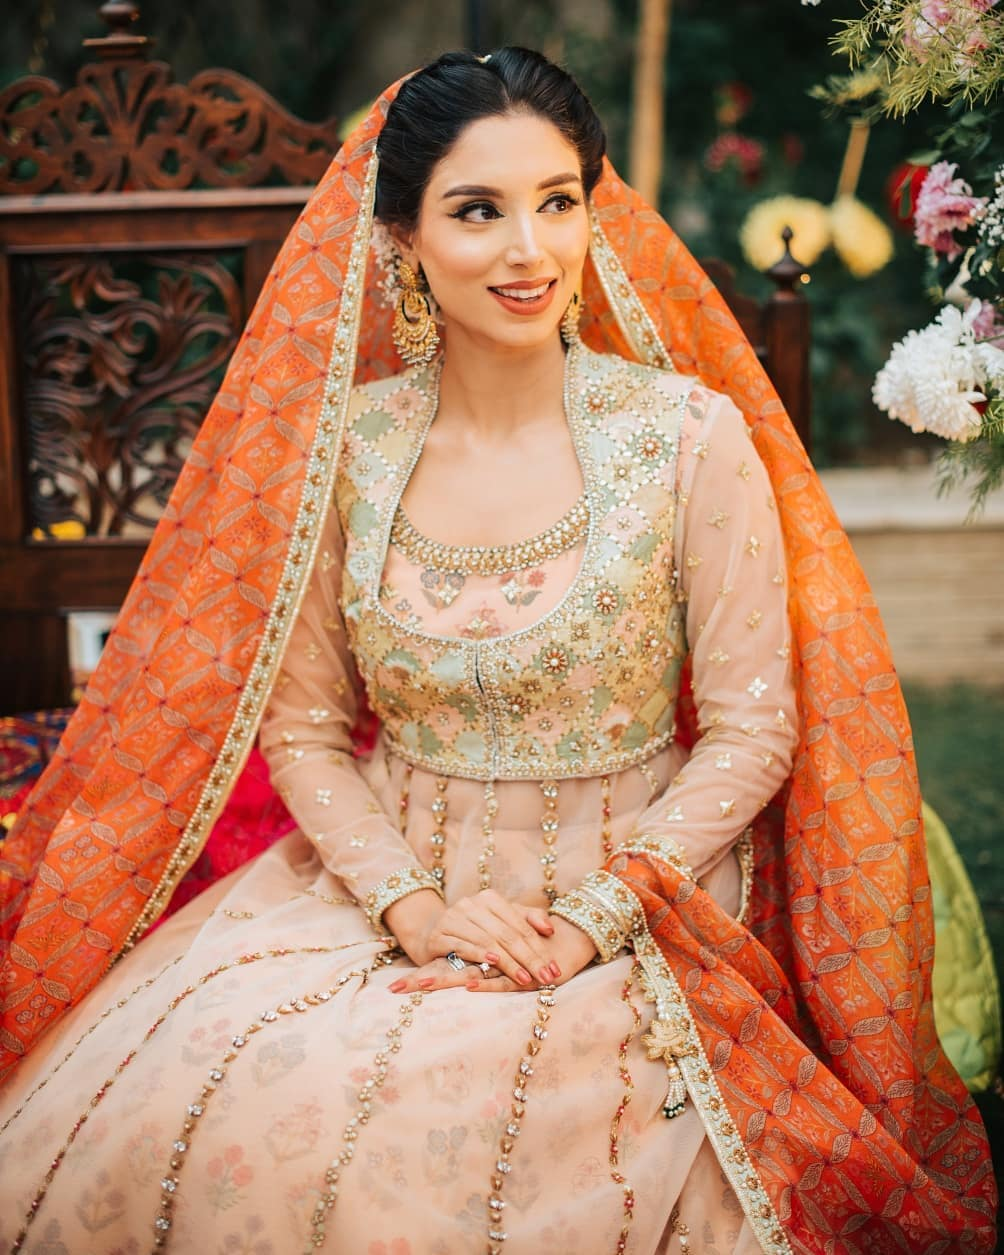 Sports Presenter Zainab Abbas Beautiful Mayun Pictures